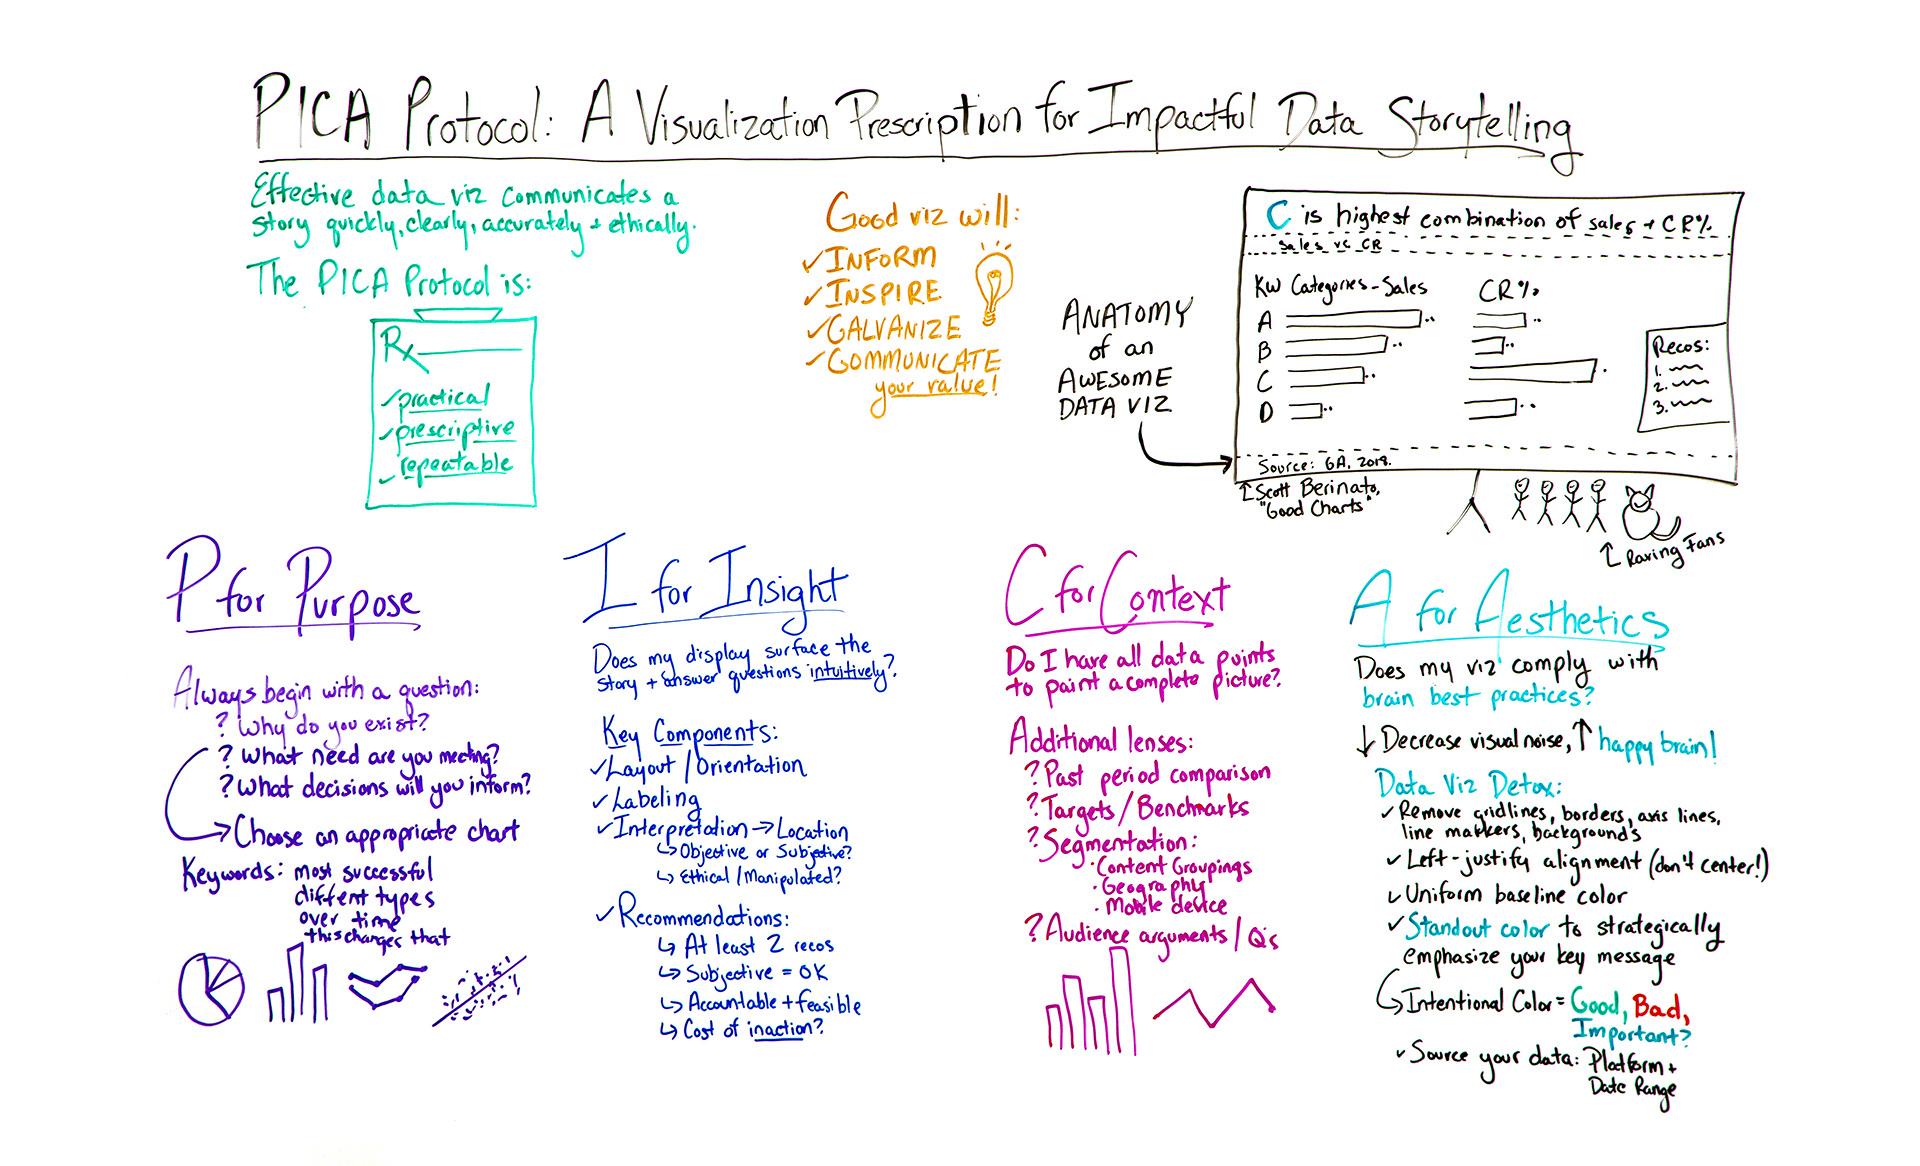 A Visualization Prescription for Impactful Storytelling